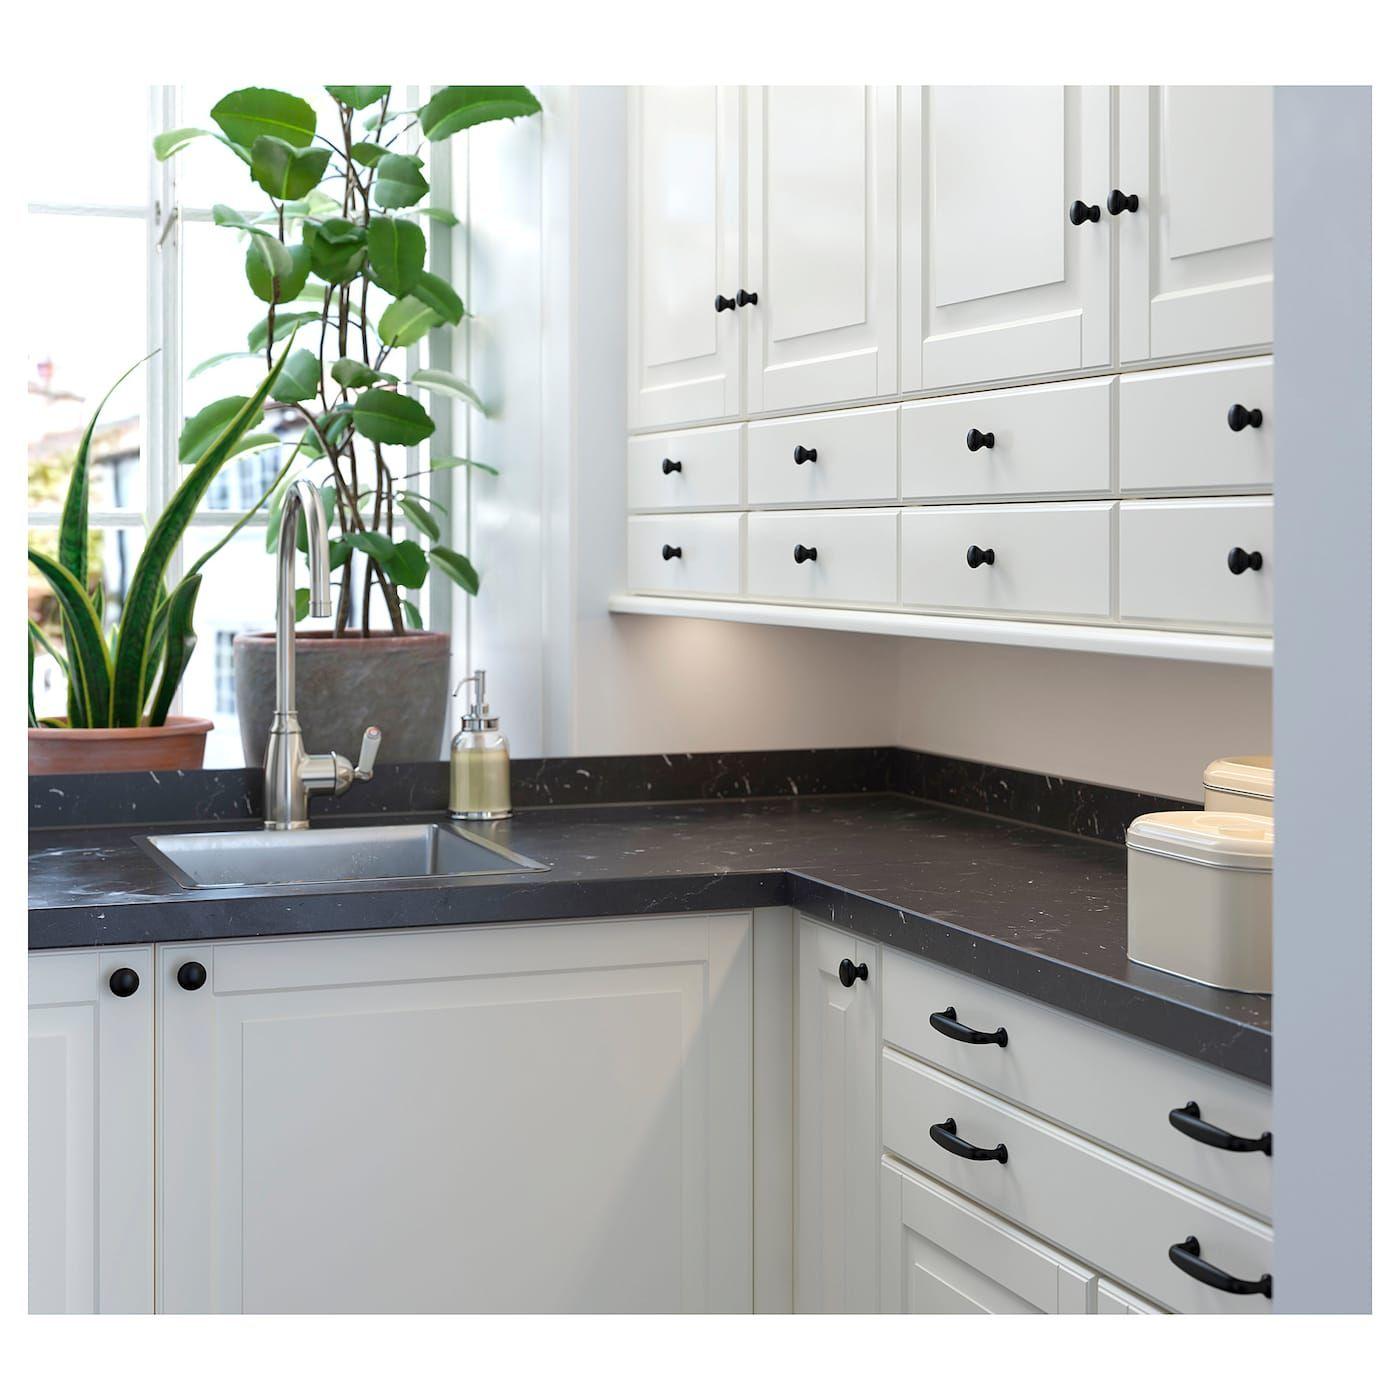 Ikea Saljan Black Marble Effect Laminate Countertop In 2019 Laminate Countertops Ikea Kitchen Countertops Kitchen Countertops